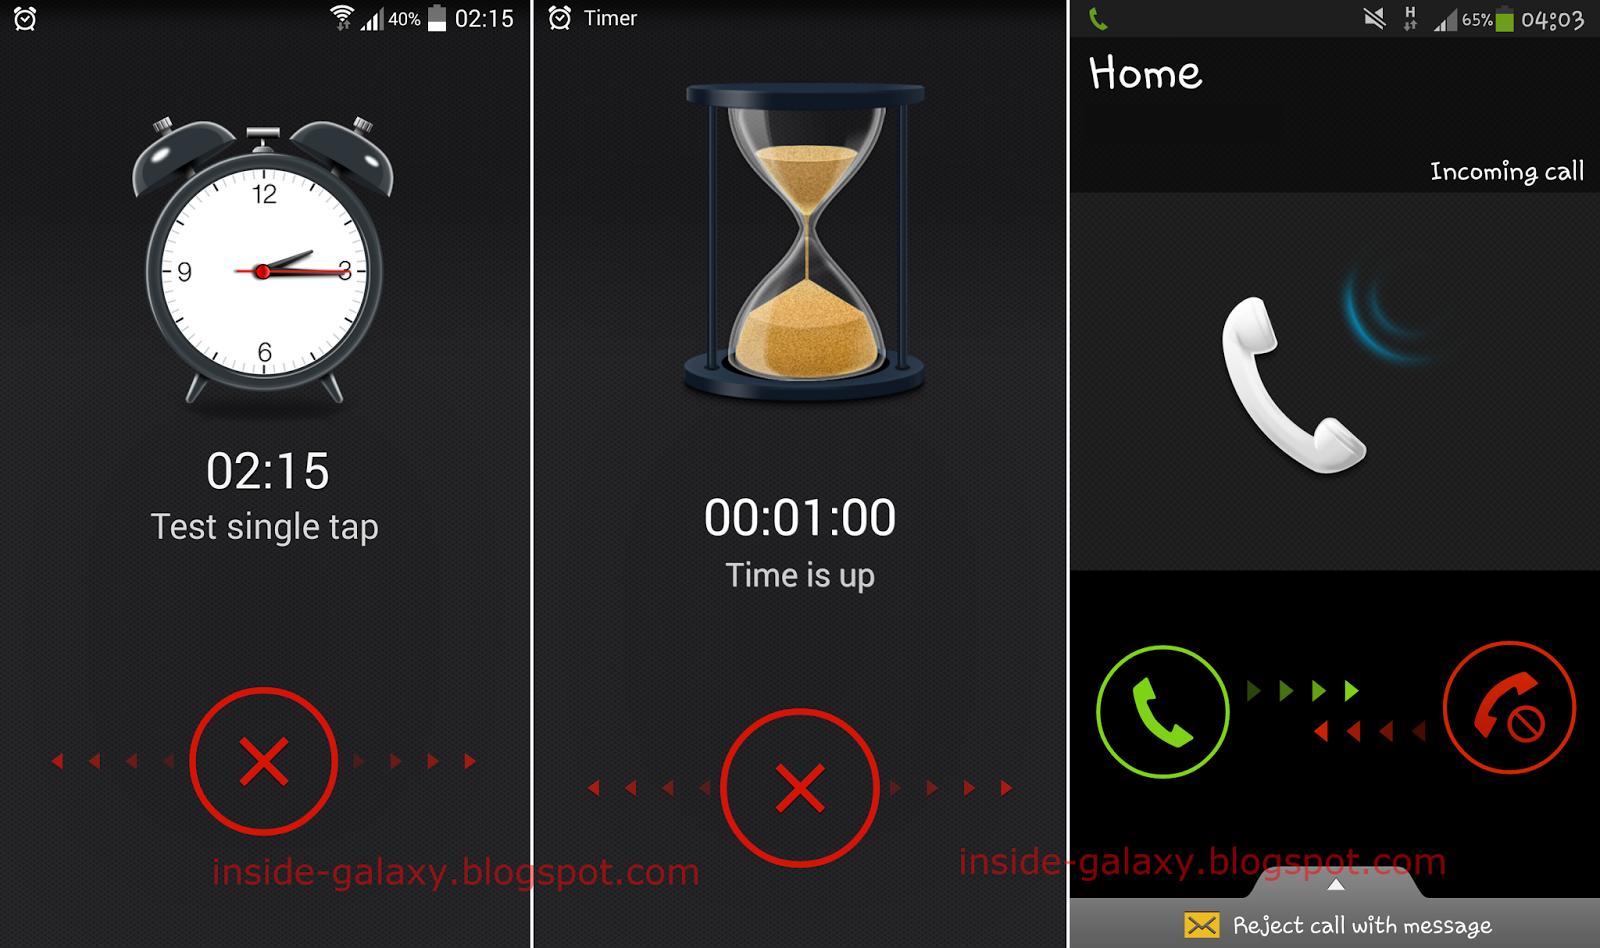 Samsung Galaxy S4 Call Screen